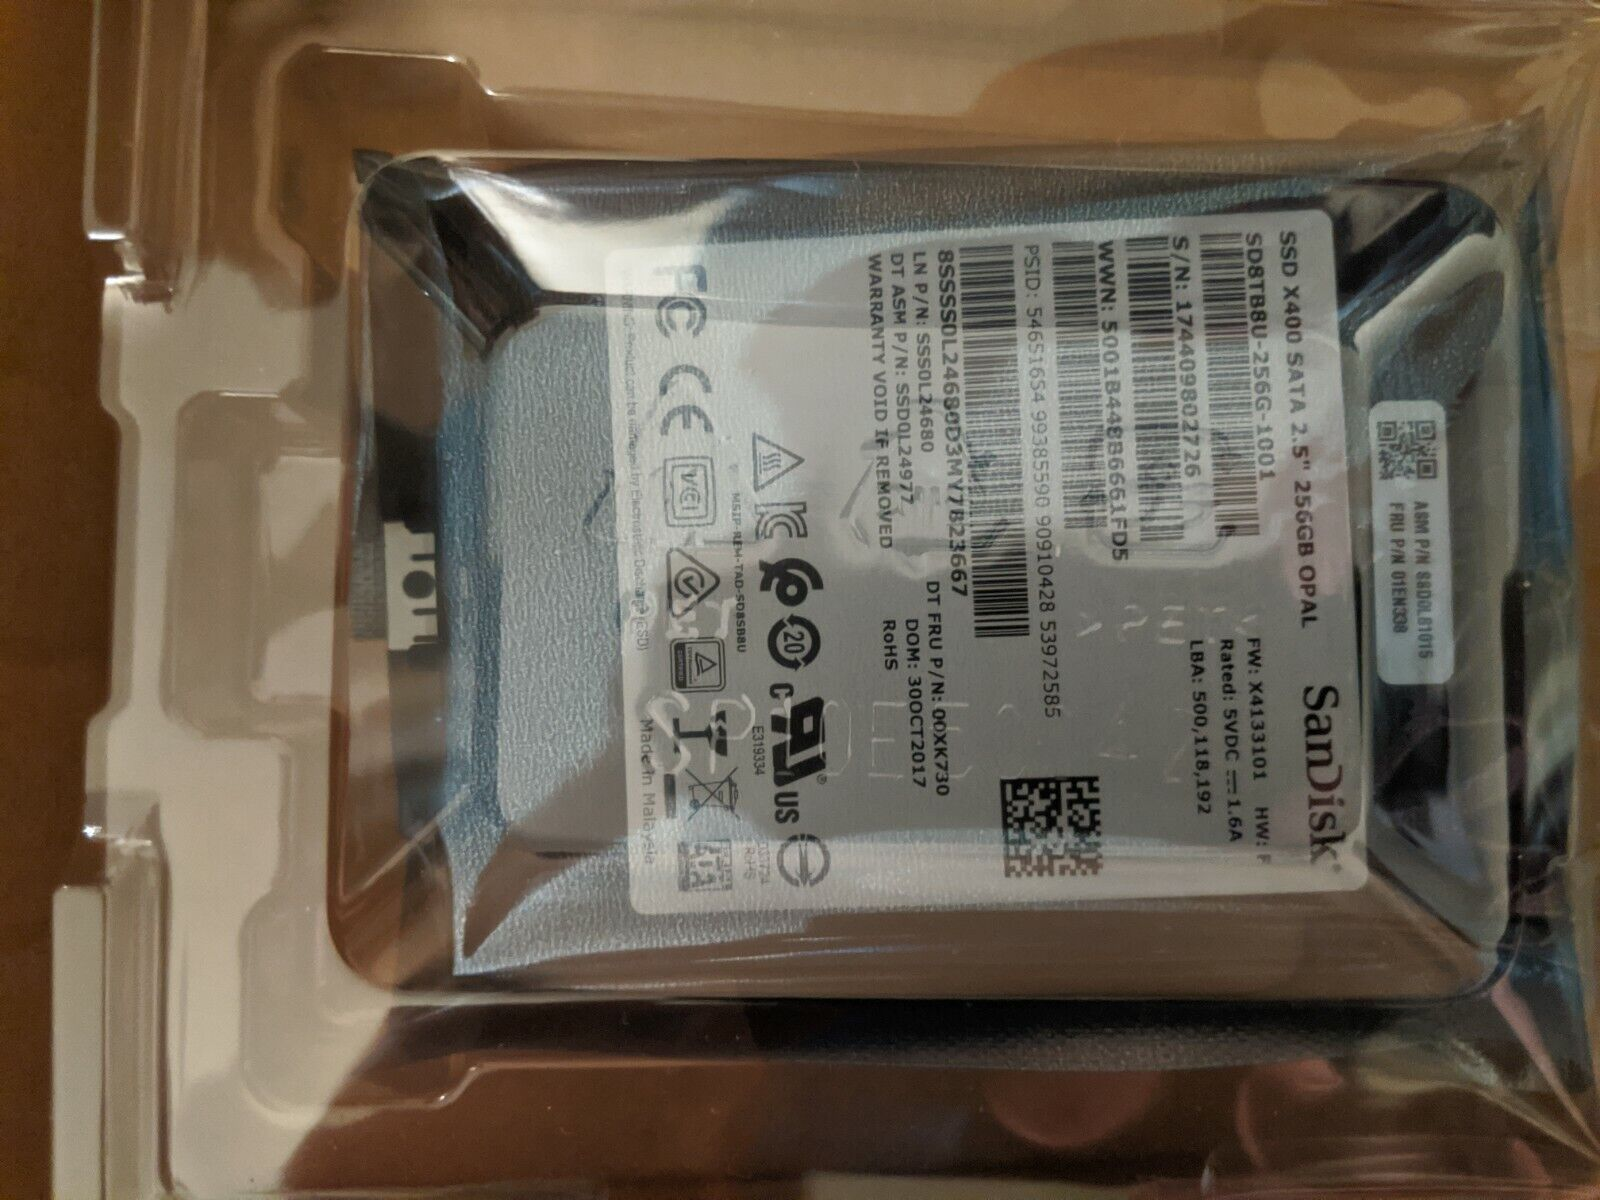 New Genuine 01EN165 For Lenovo ThinkPad Yoga 256GB SSD Hard Drive